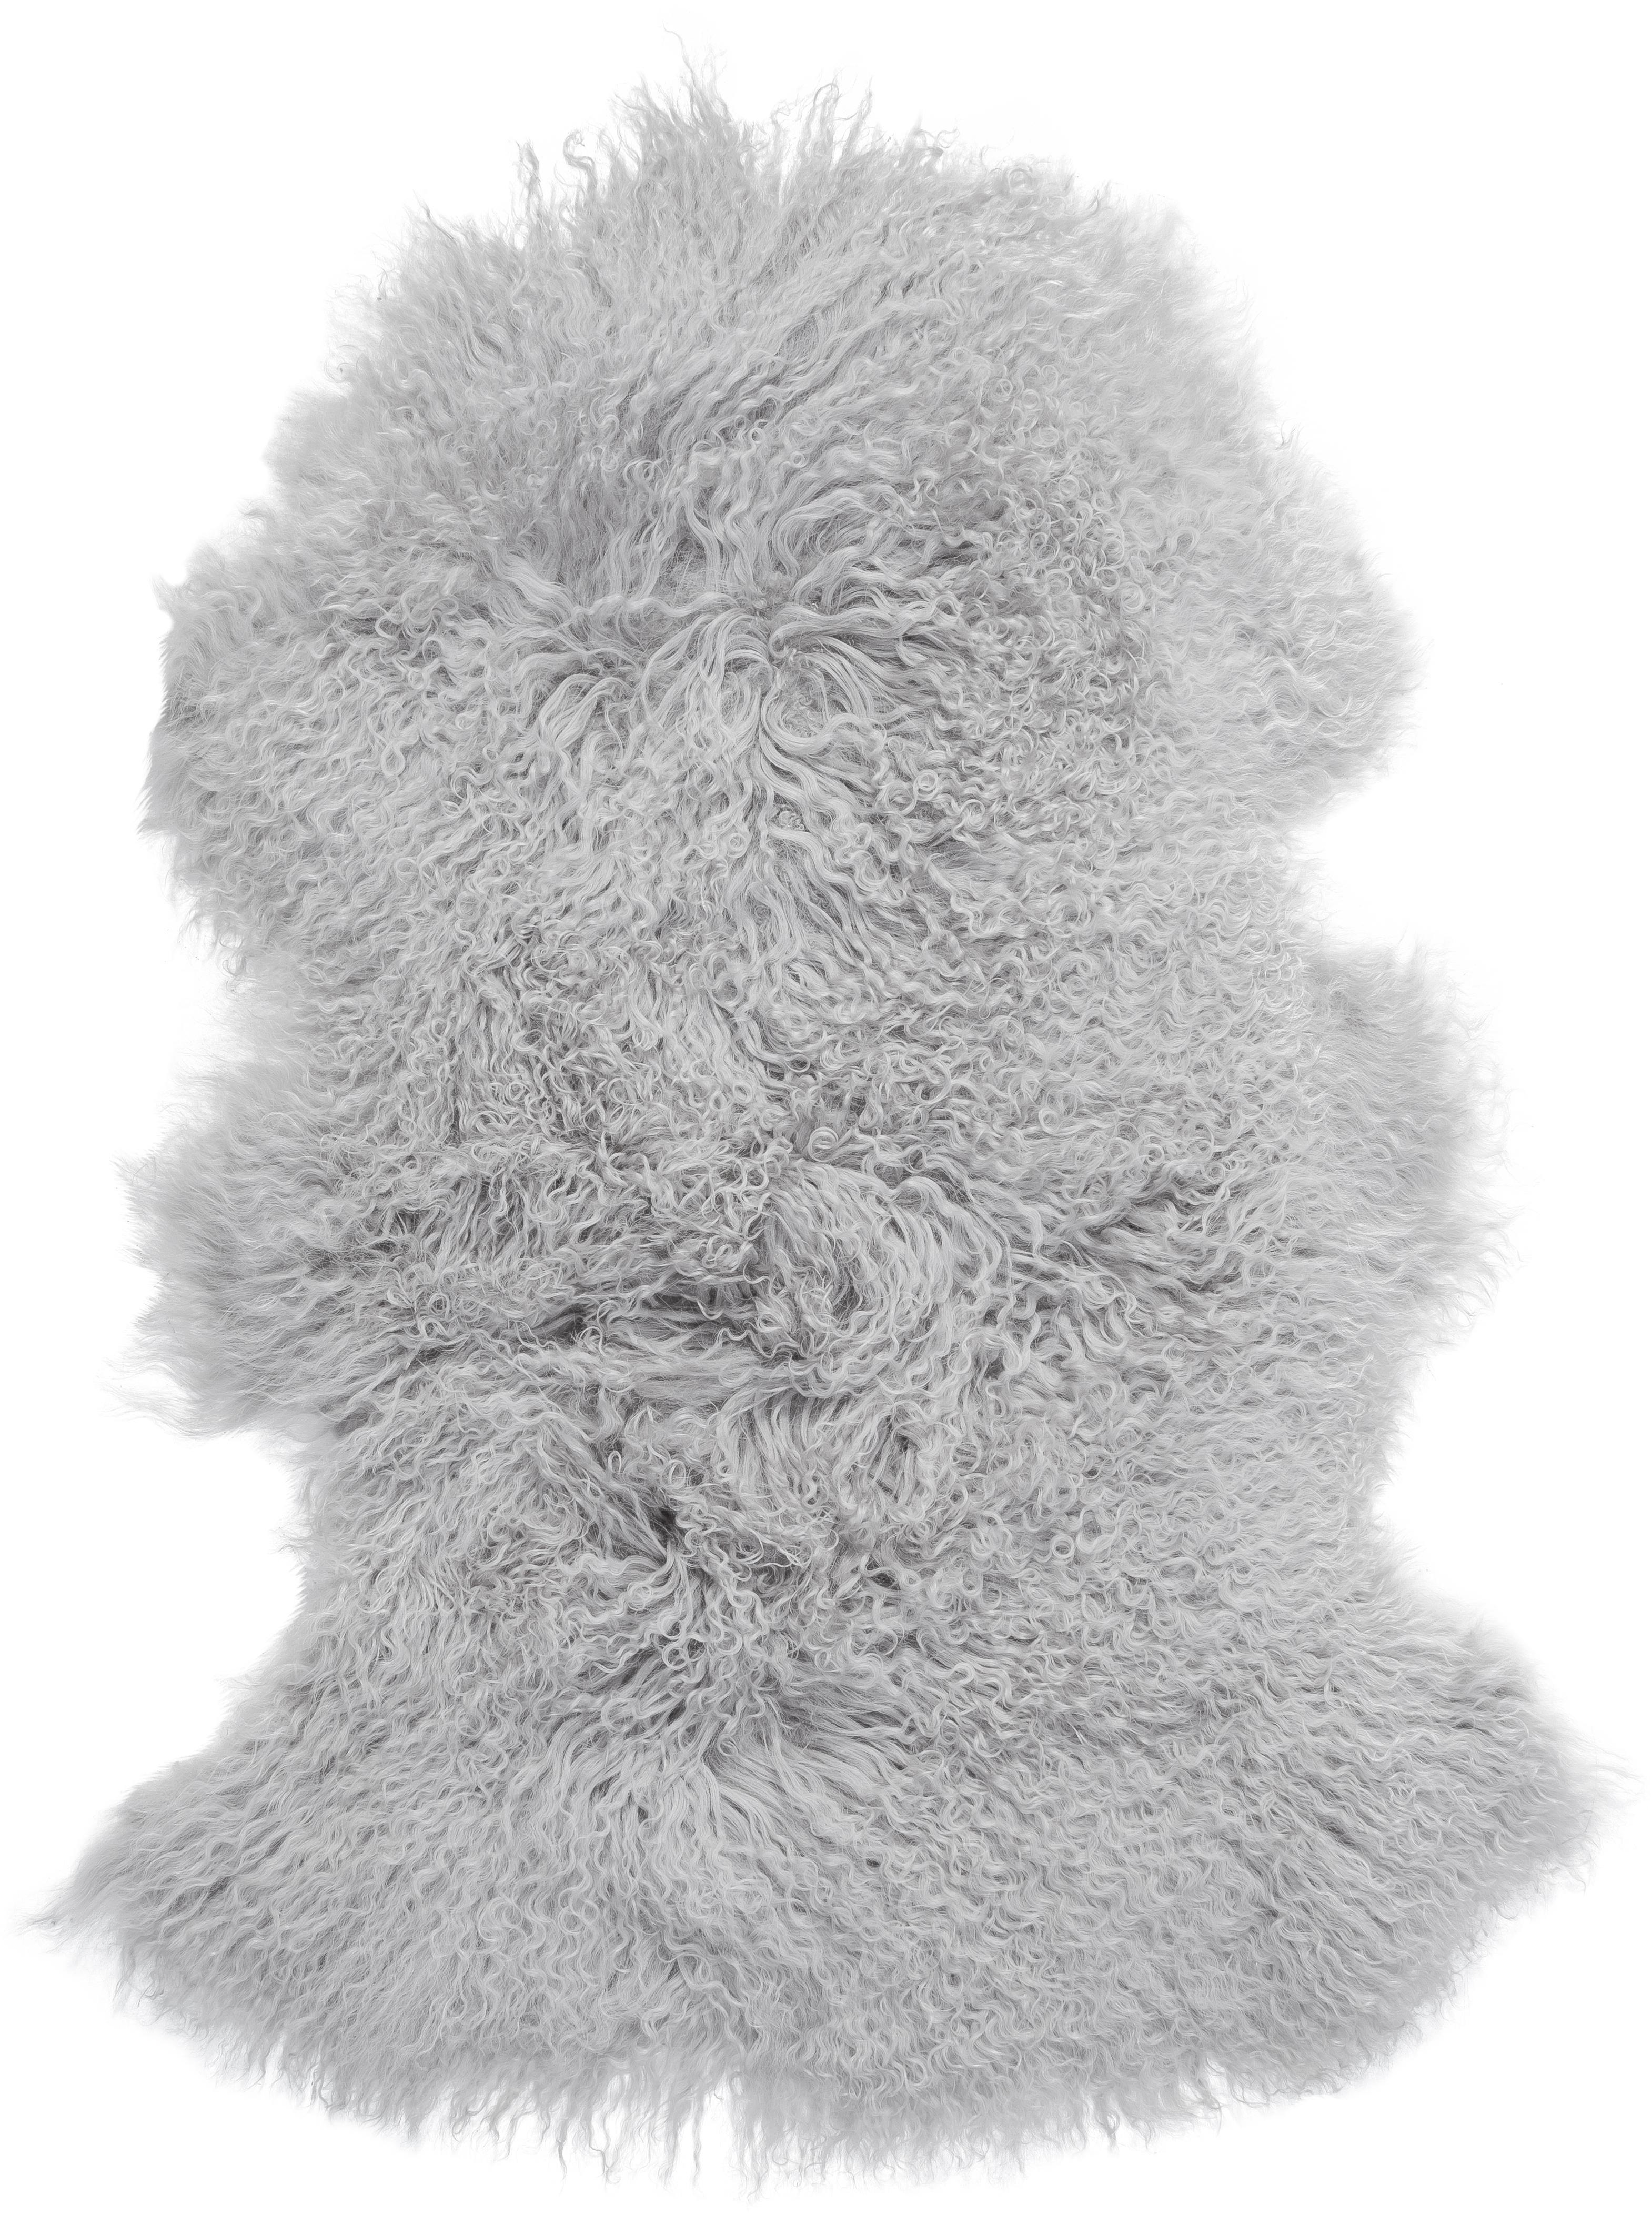 Langhaar-Lammfell Ella, gelockt, Vorderseite: Mongolisches Lammfell, Rückseite: Leder, Hellgrau, 50 x 80 cm